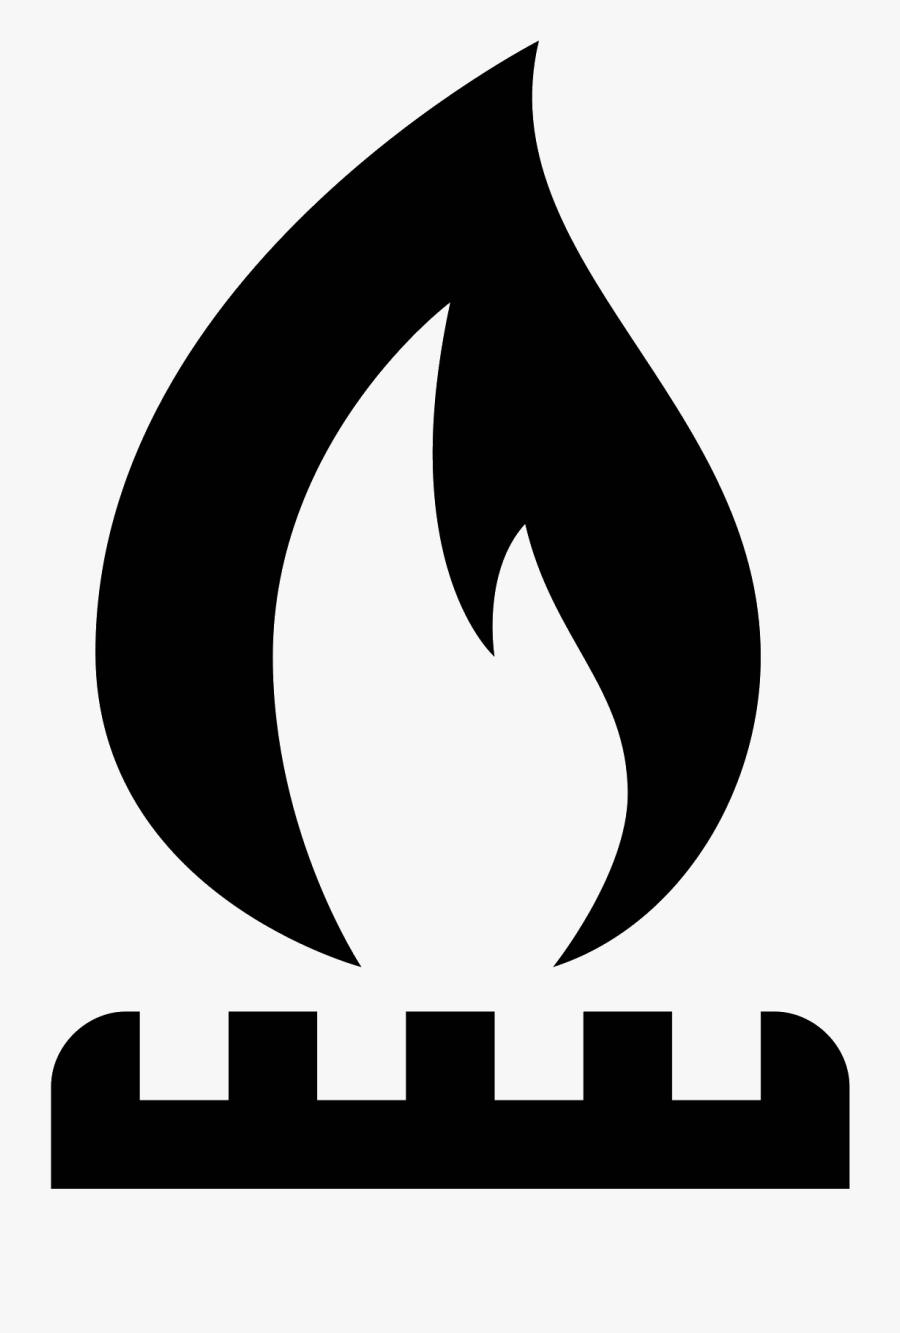 Industria Icono Descarga Gratuita - Natural Gas Icon Png, Transparent Clipart